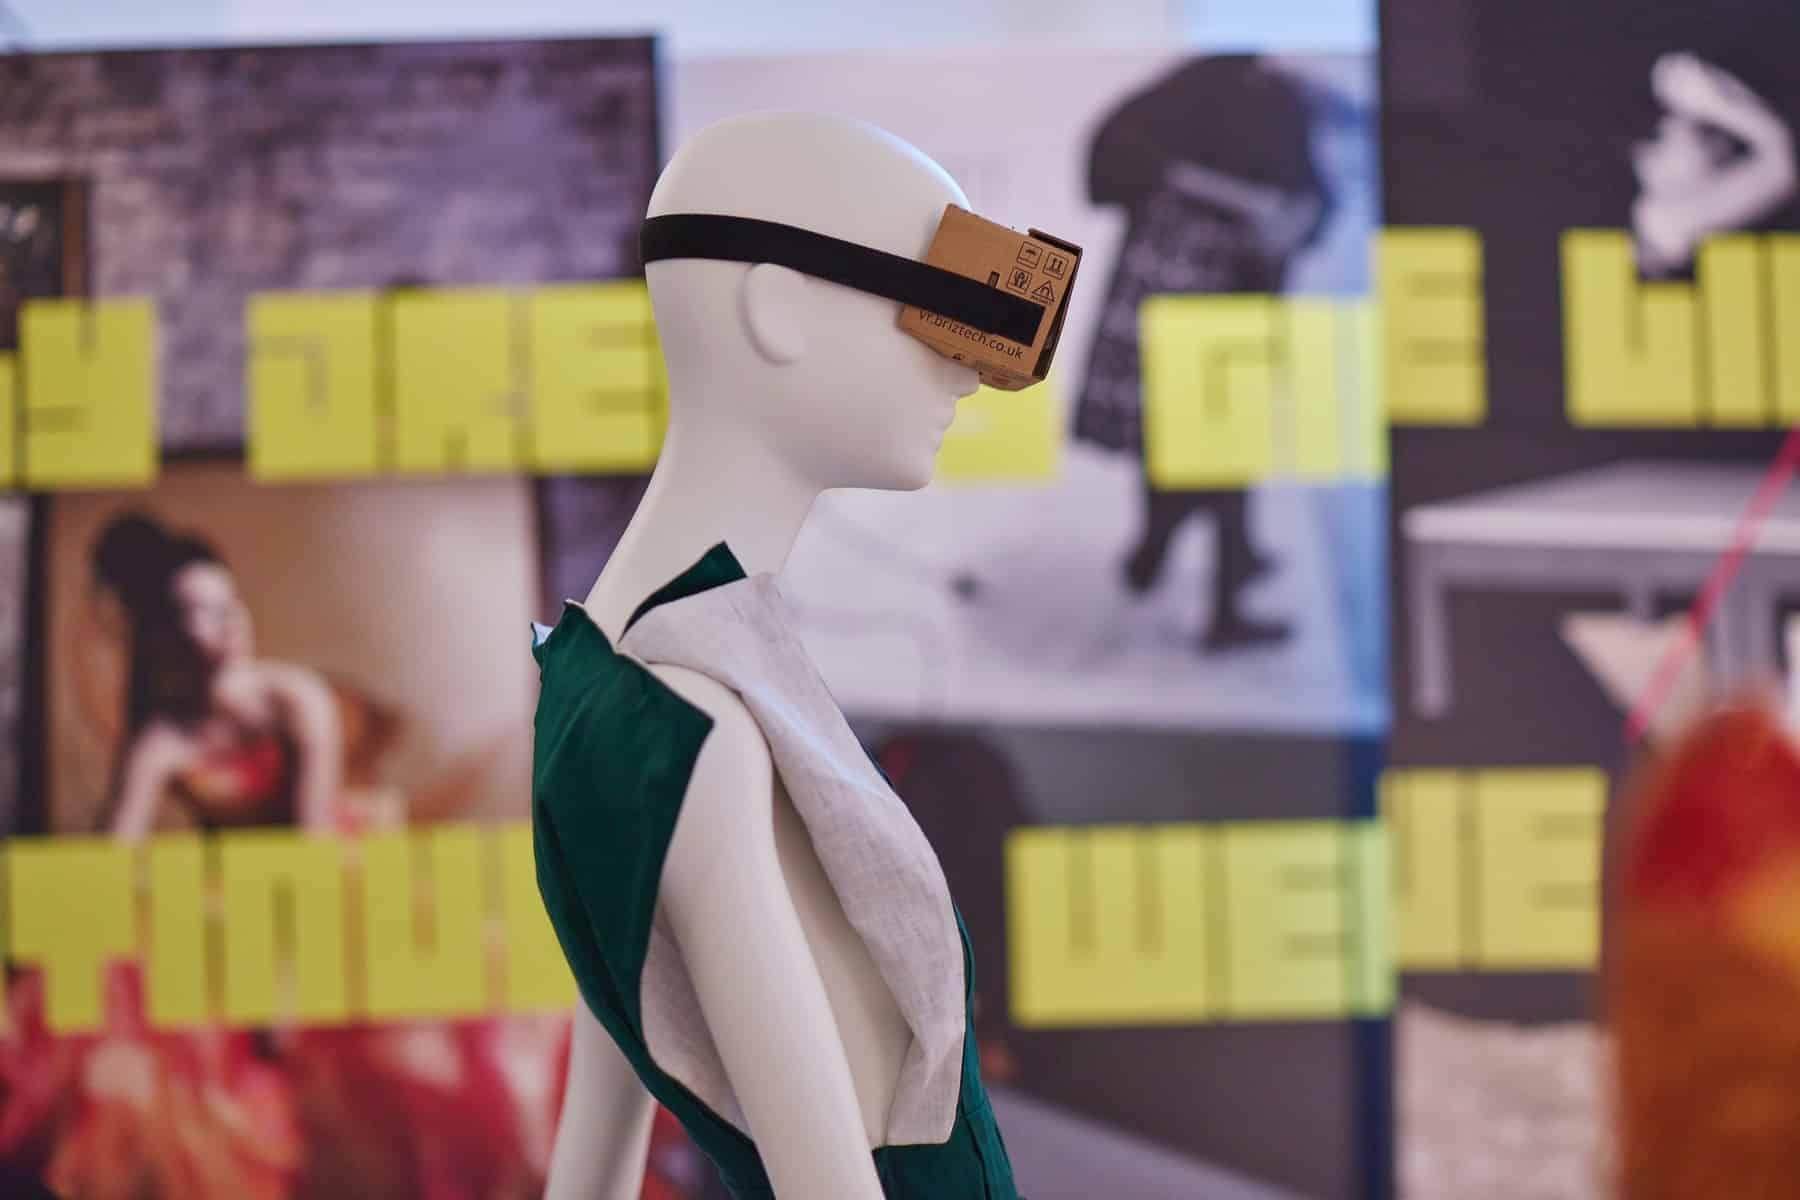 Fashion Utopias -  IFS2016 at Somerset House London